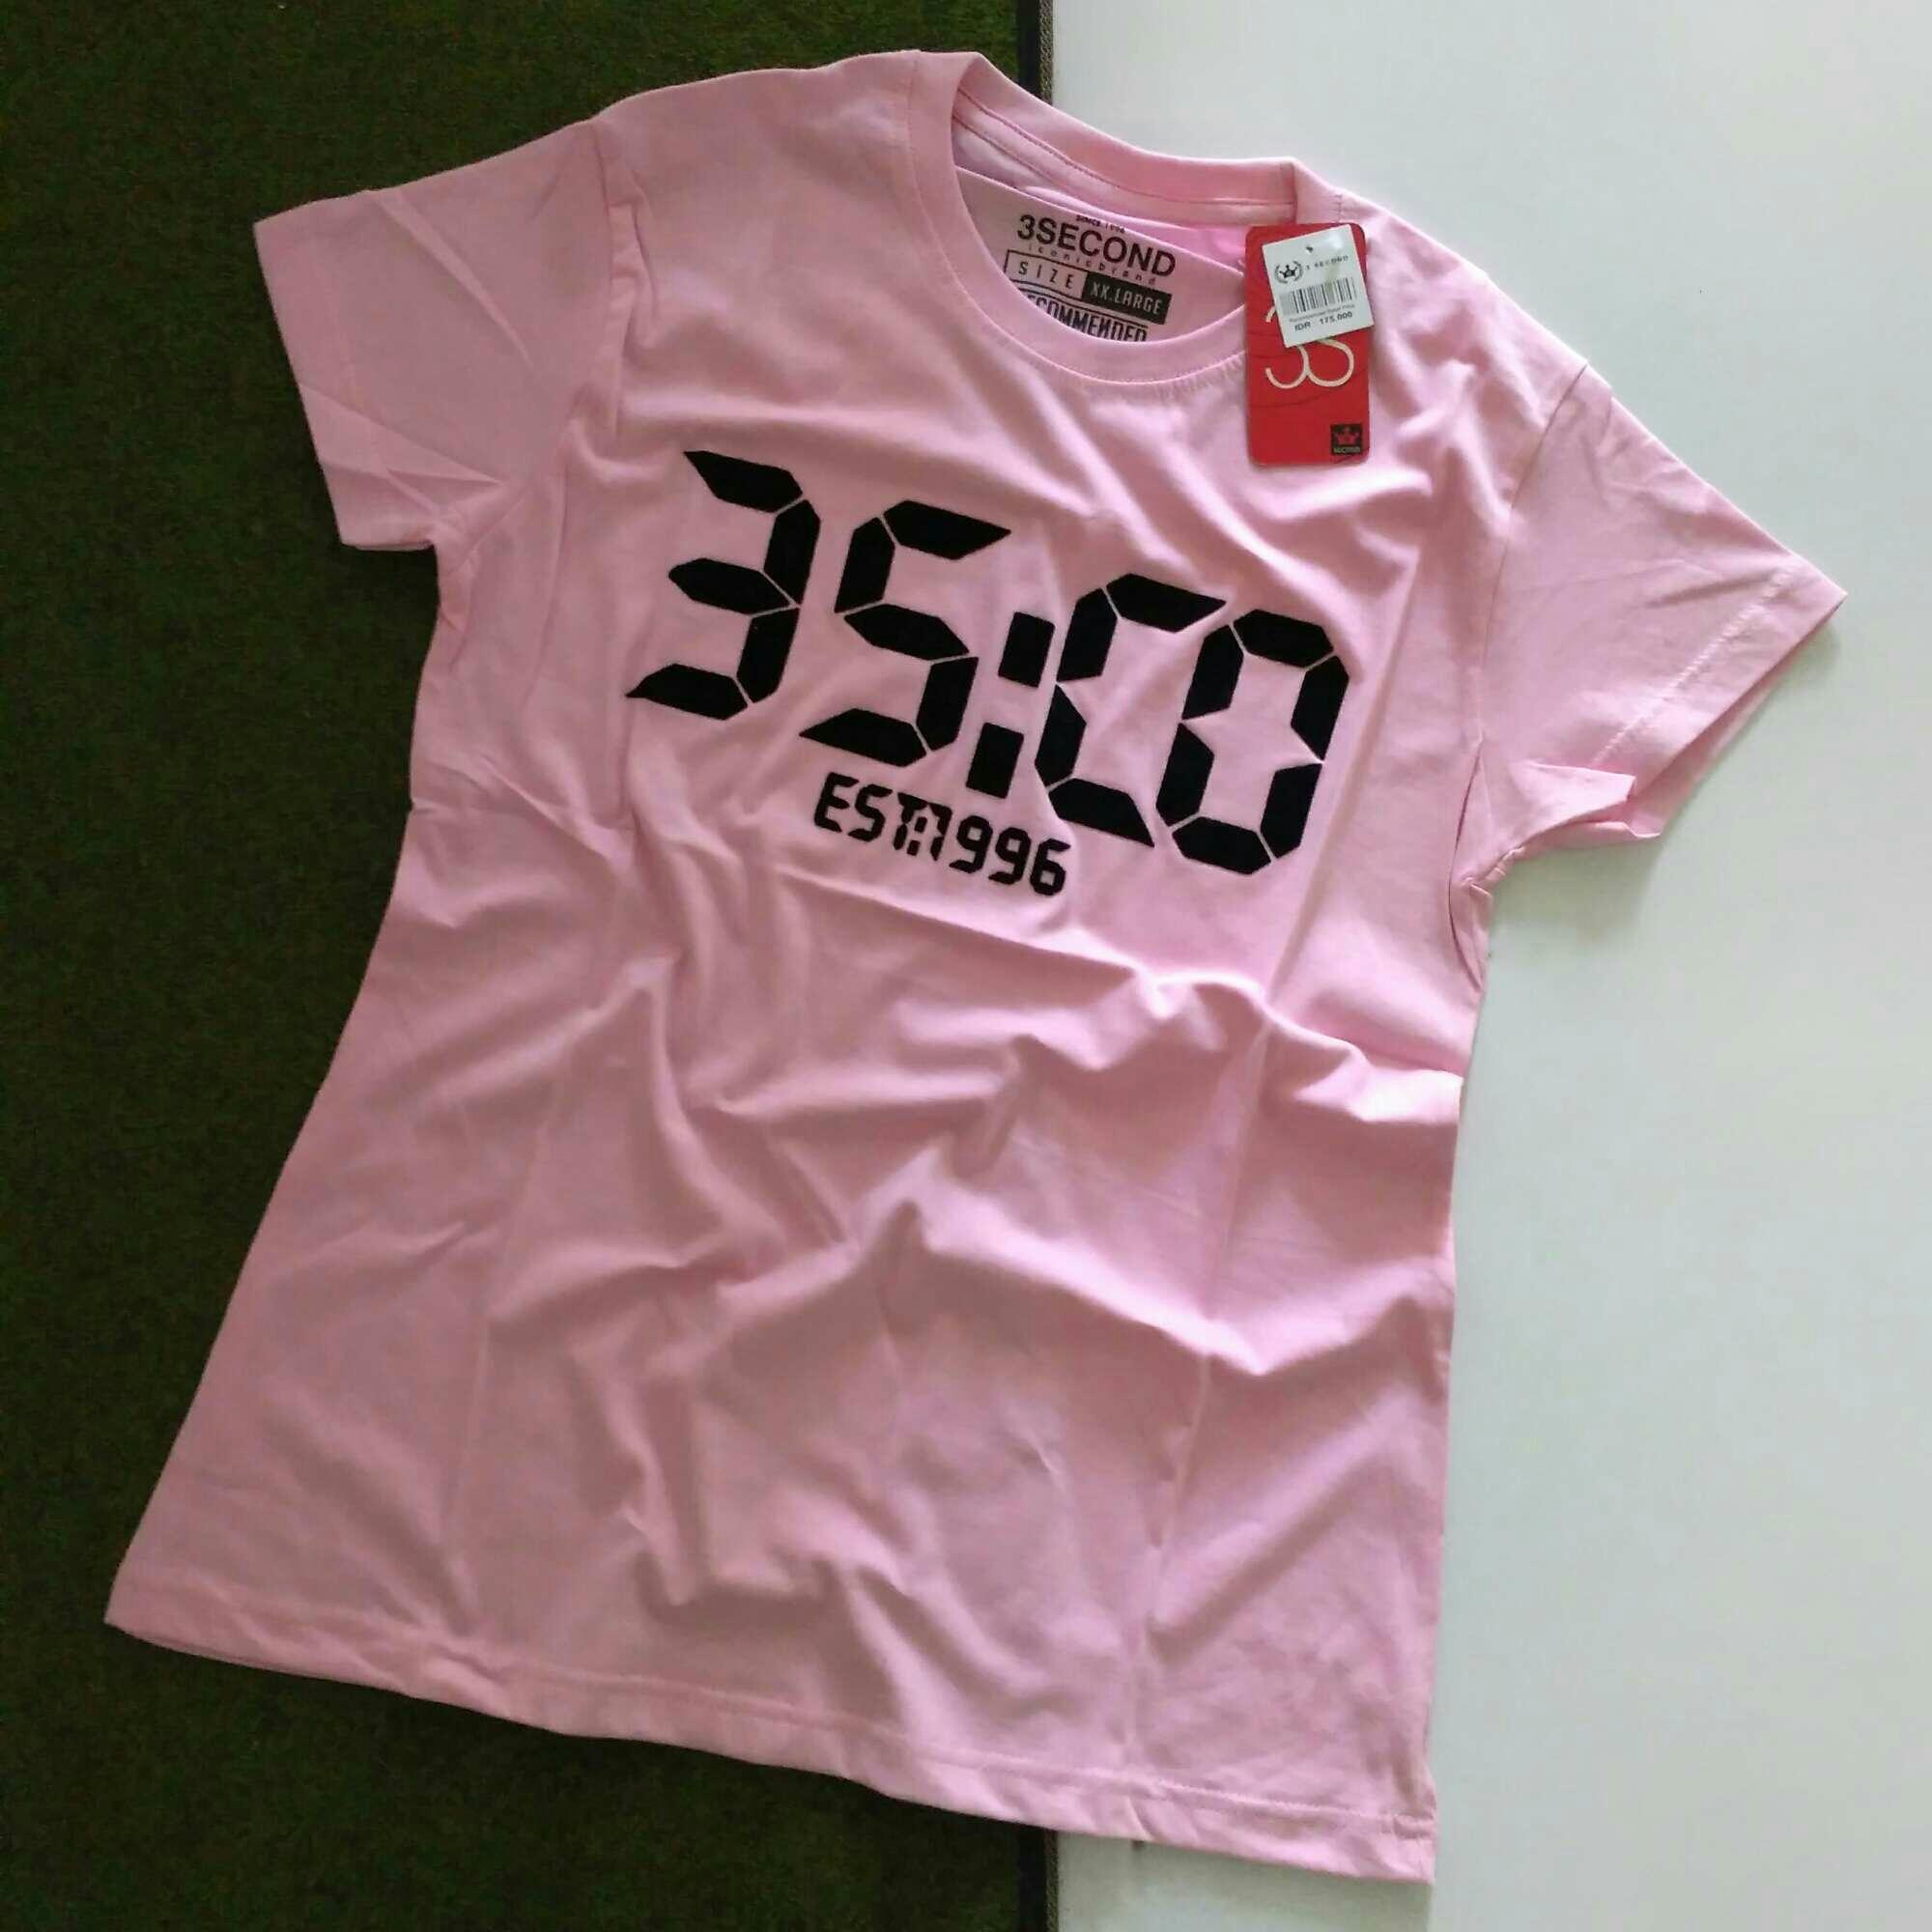 Rp 75.000. Kaos Jumbo Bigsize XXL Atasan Baju Wanita Tshirt ... 9a95b8c670